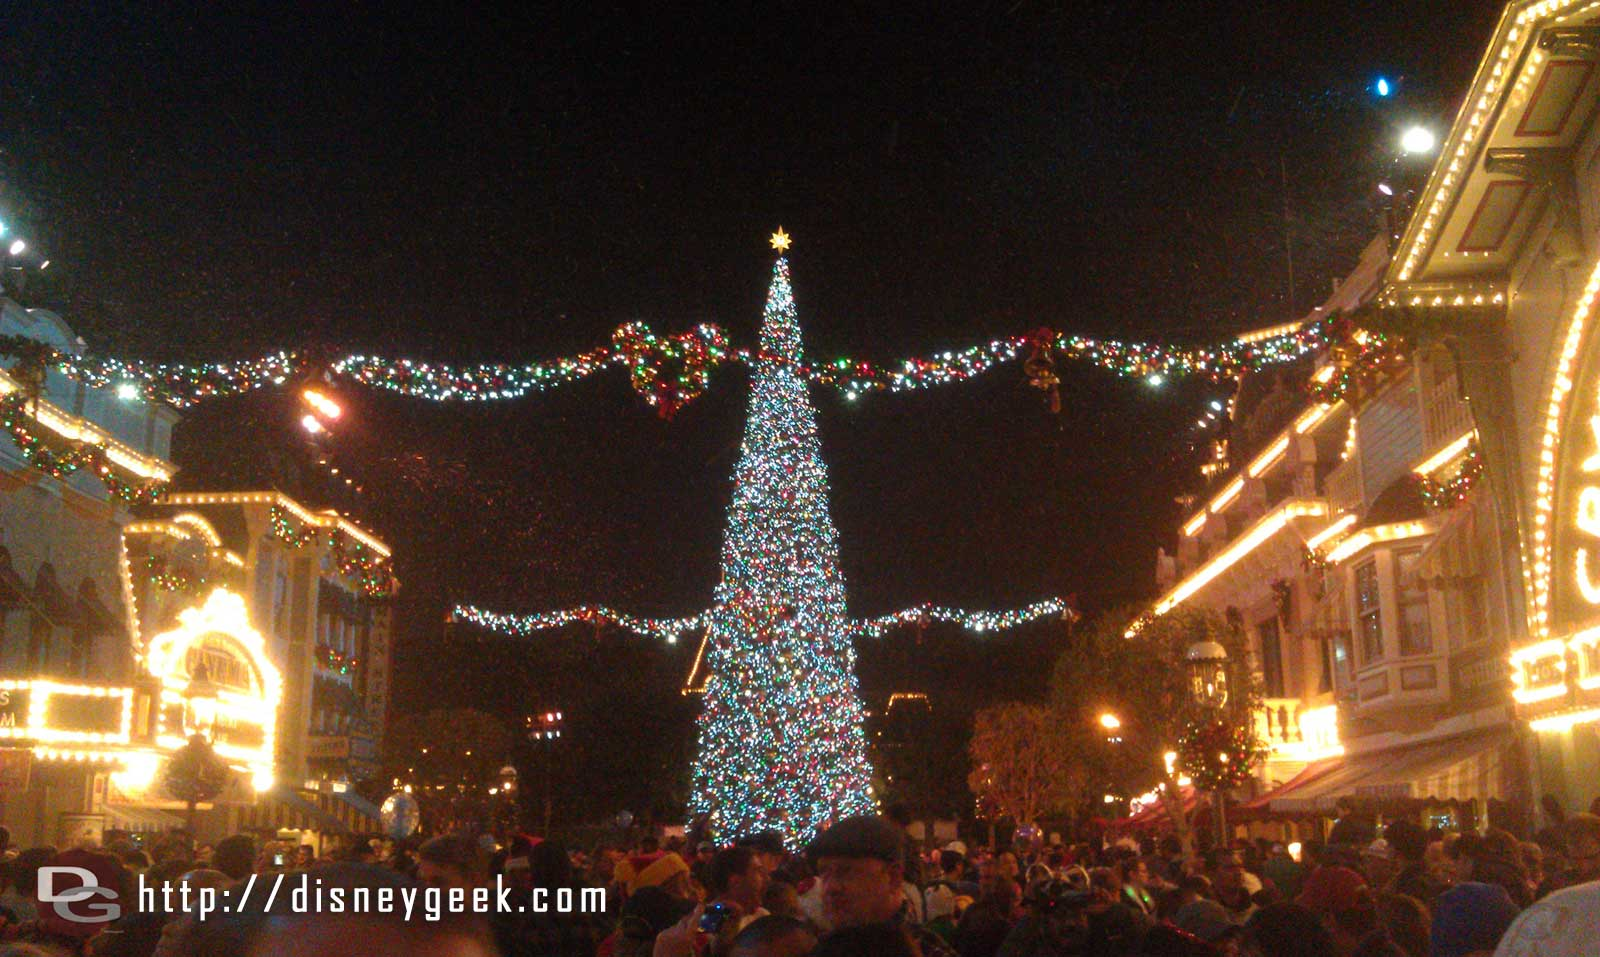 Snow falling on Main Street